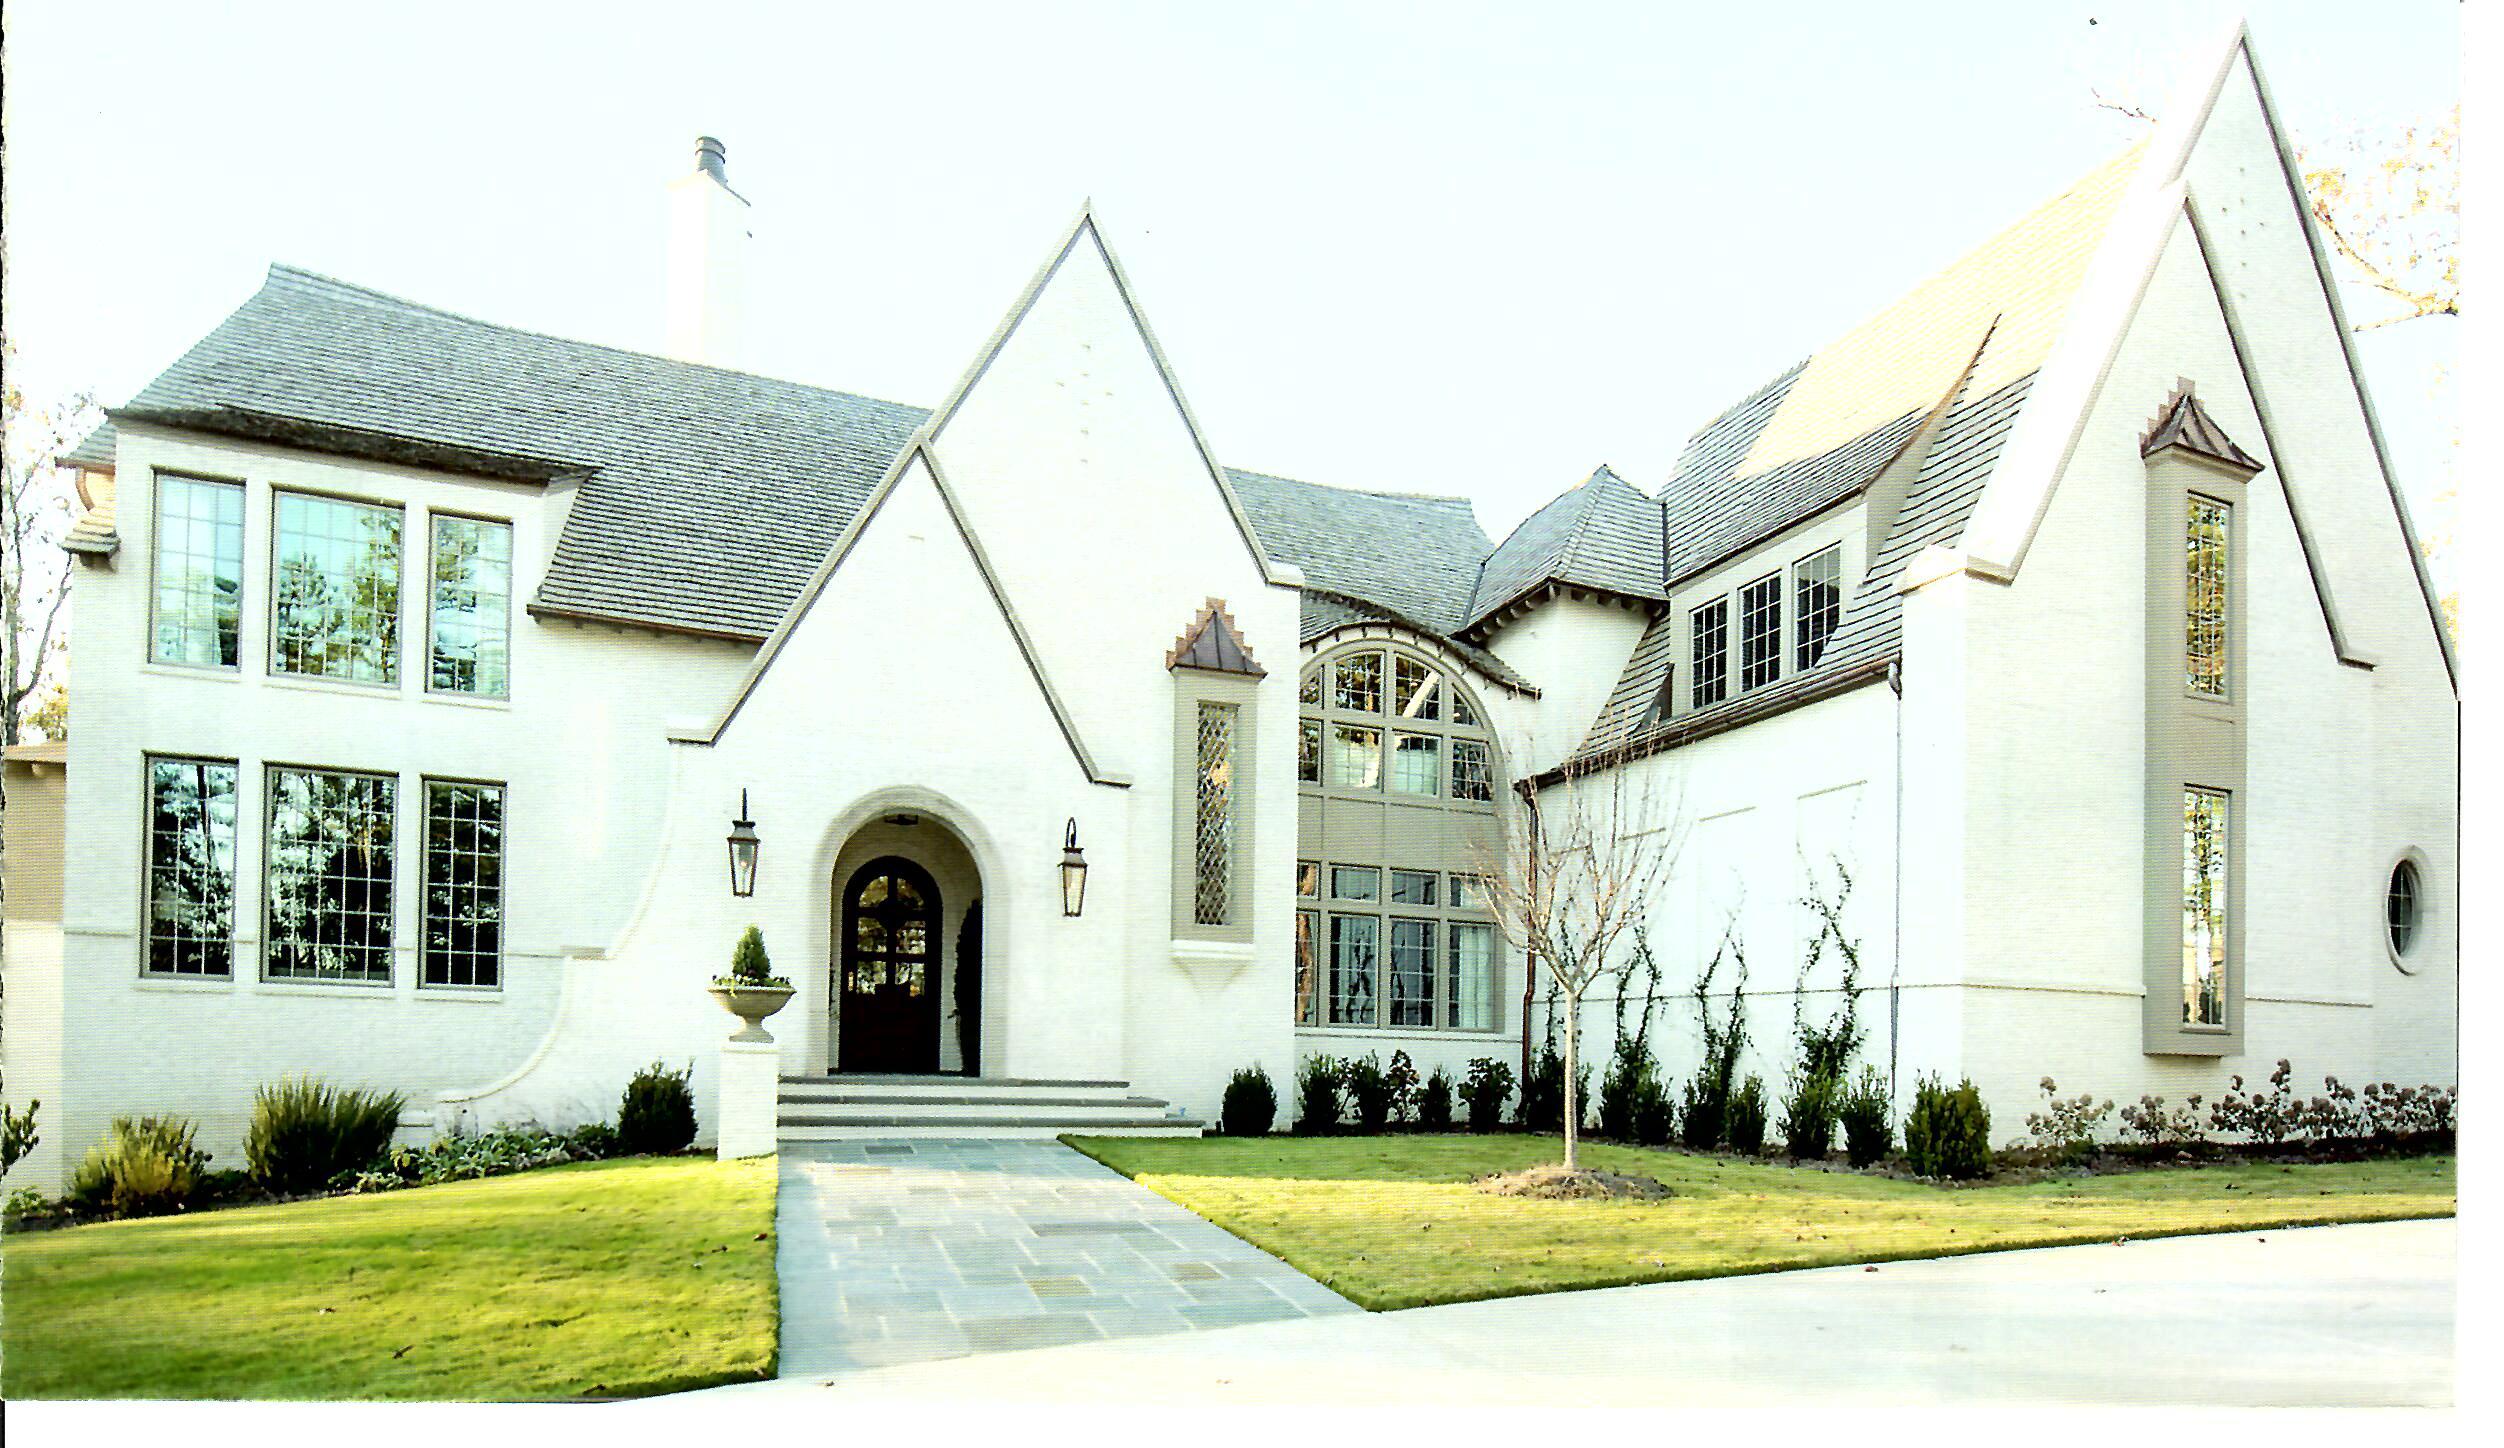 Harris coggin birmingham al custom residential builder for Custom home builders birmingham al